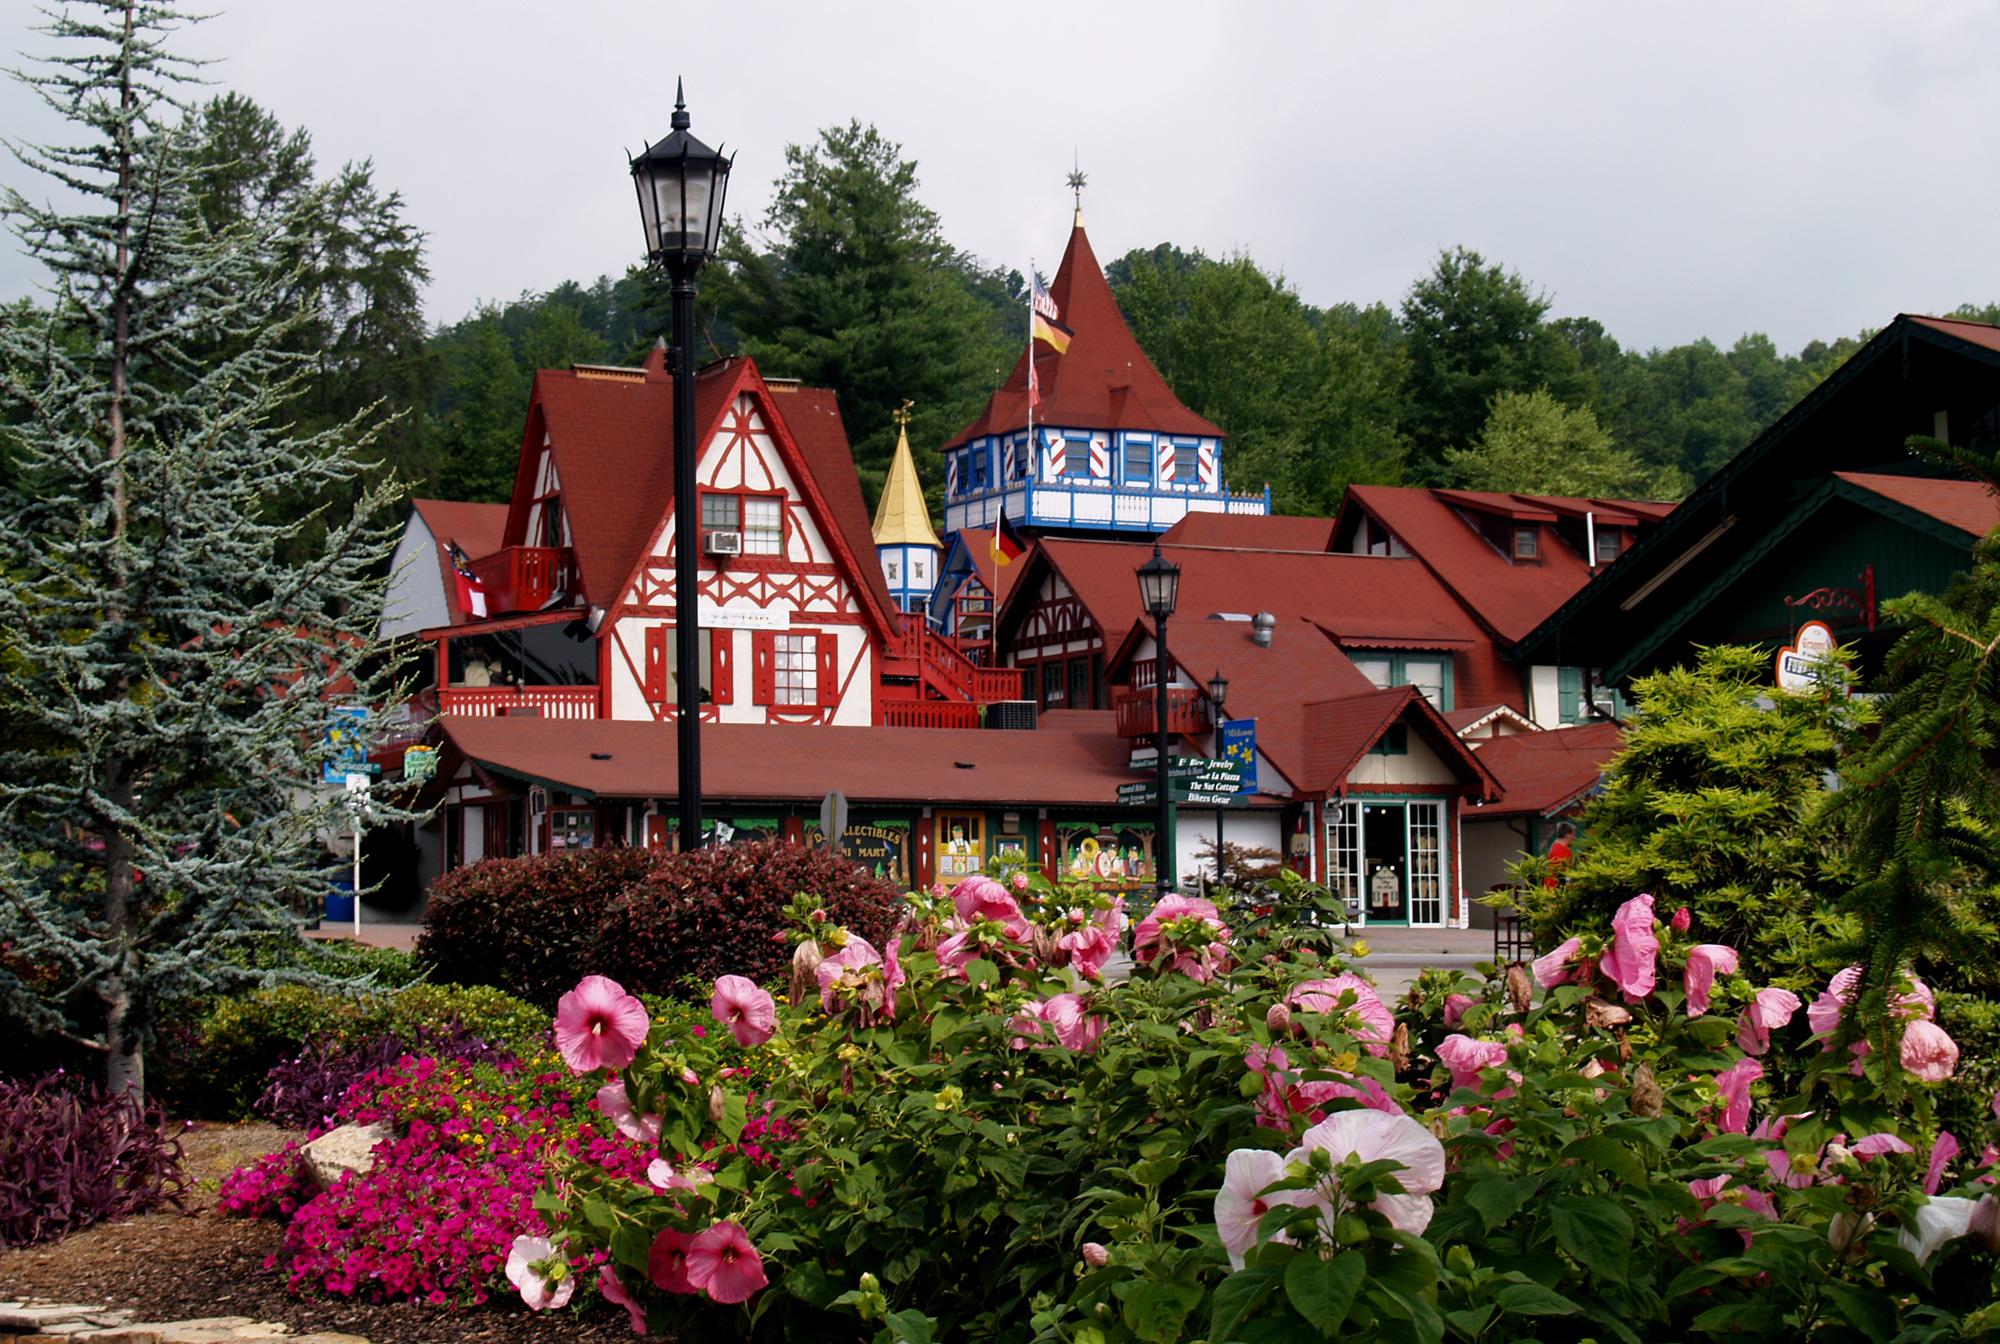 Explore The City Of Helen Explore Georgia S Little Bavaria